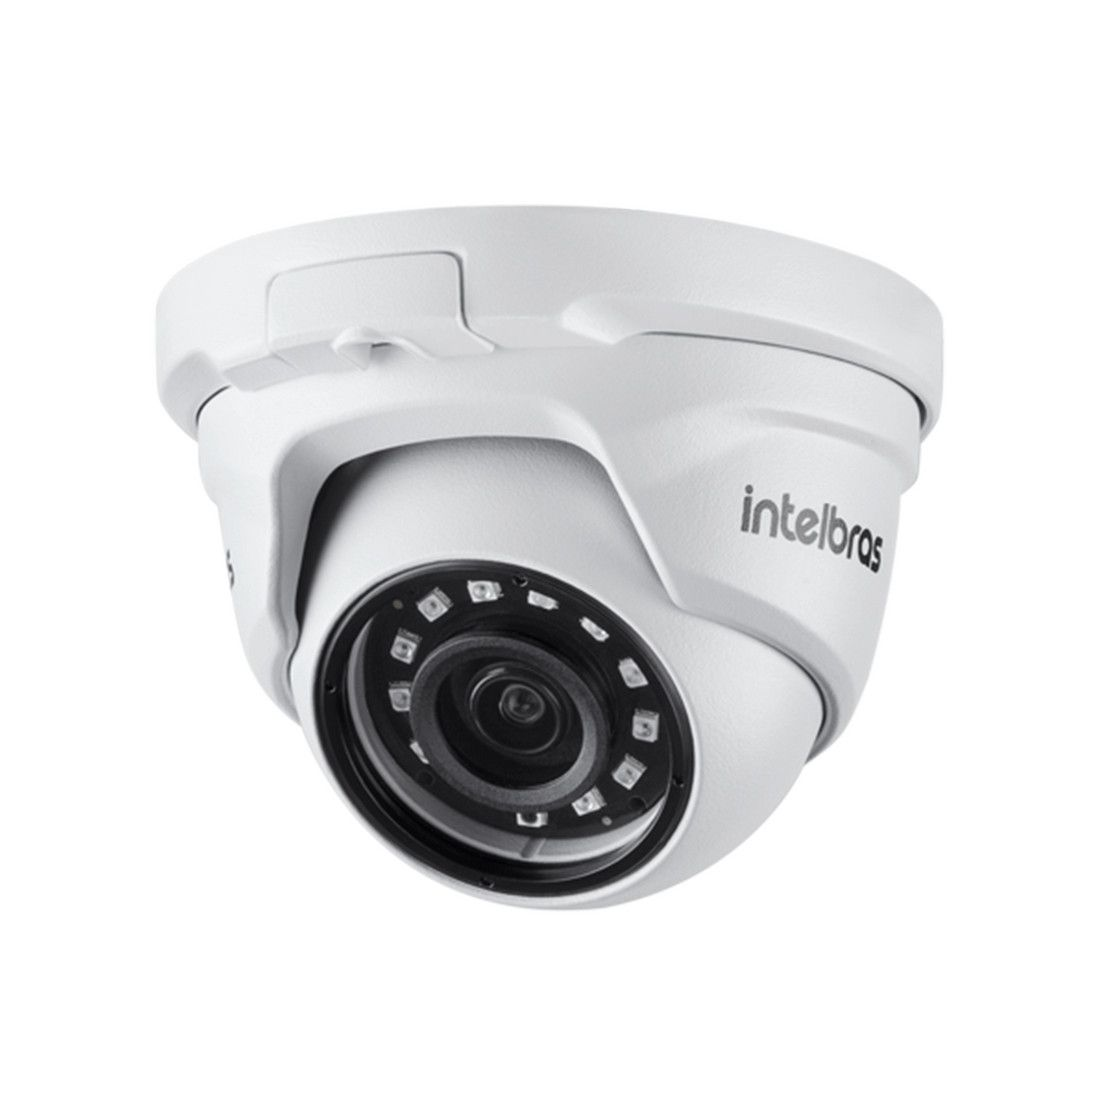 Câmera IP Intelbras VIP 1220 D G3 Full HD 2MP 2.8 mm 20 Mts